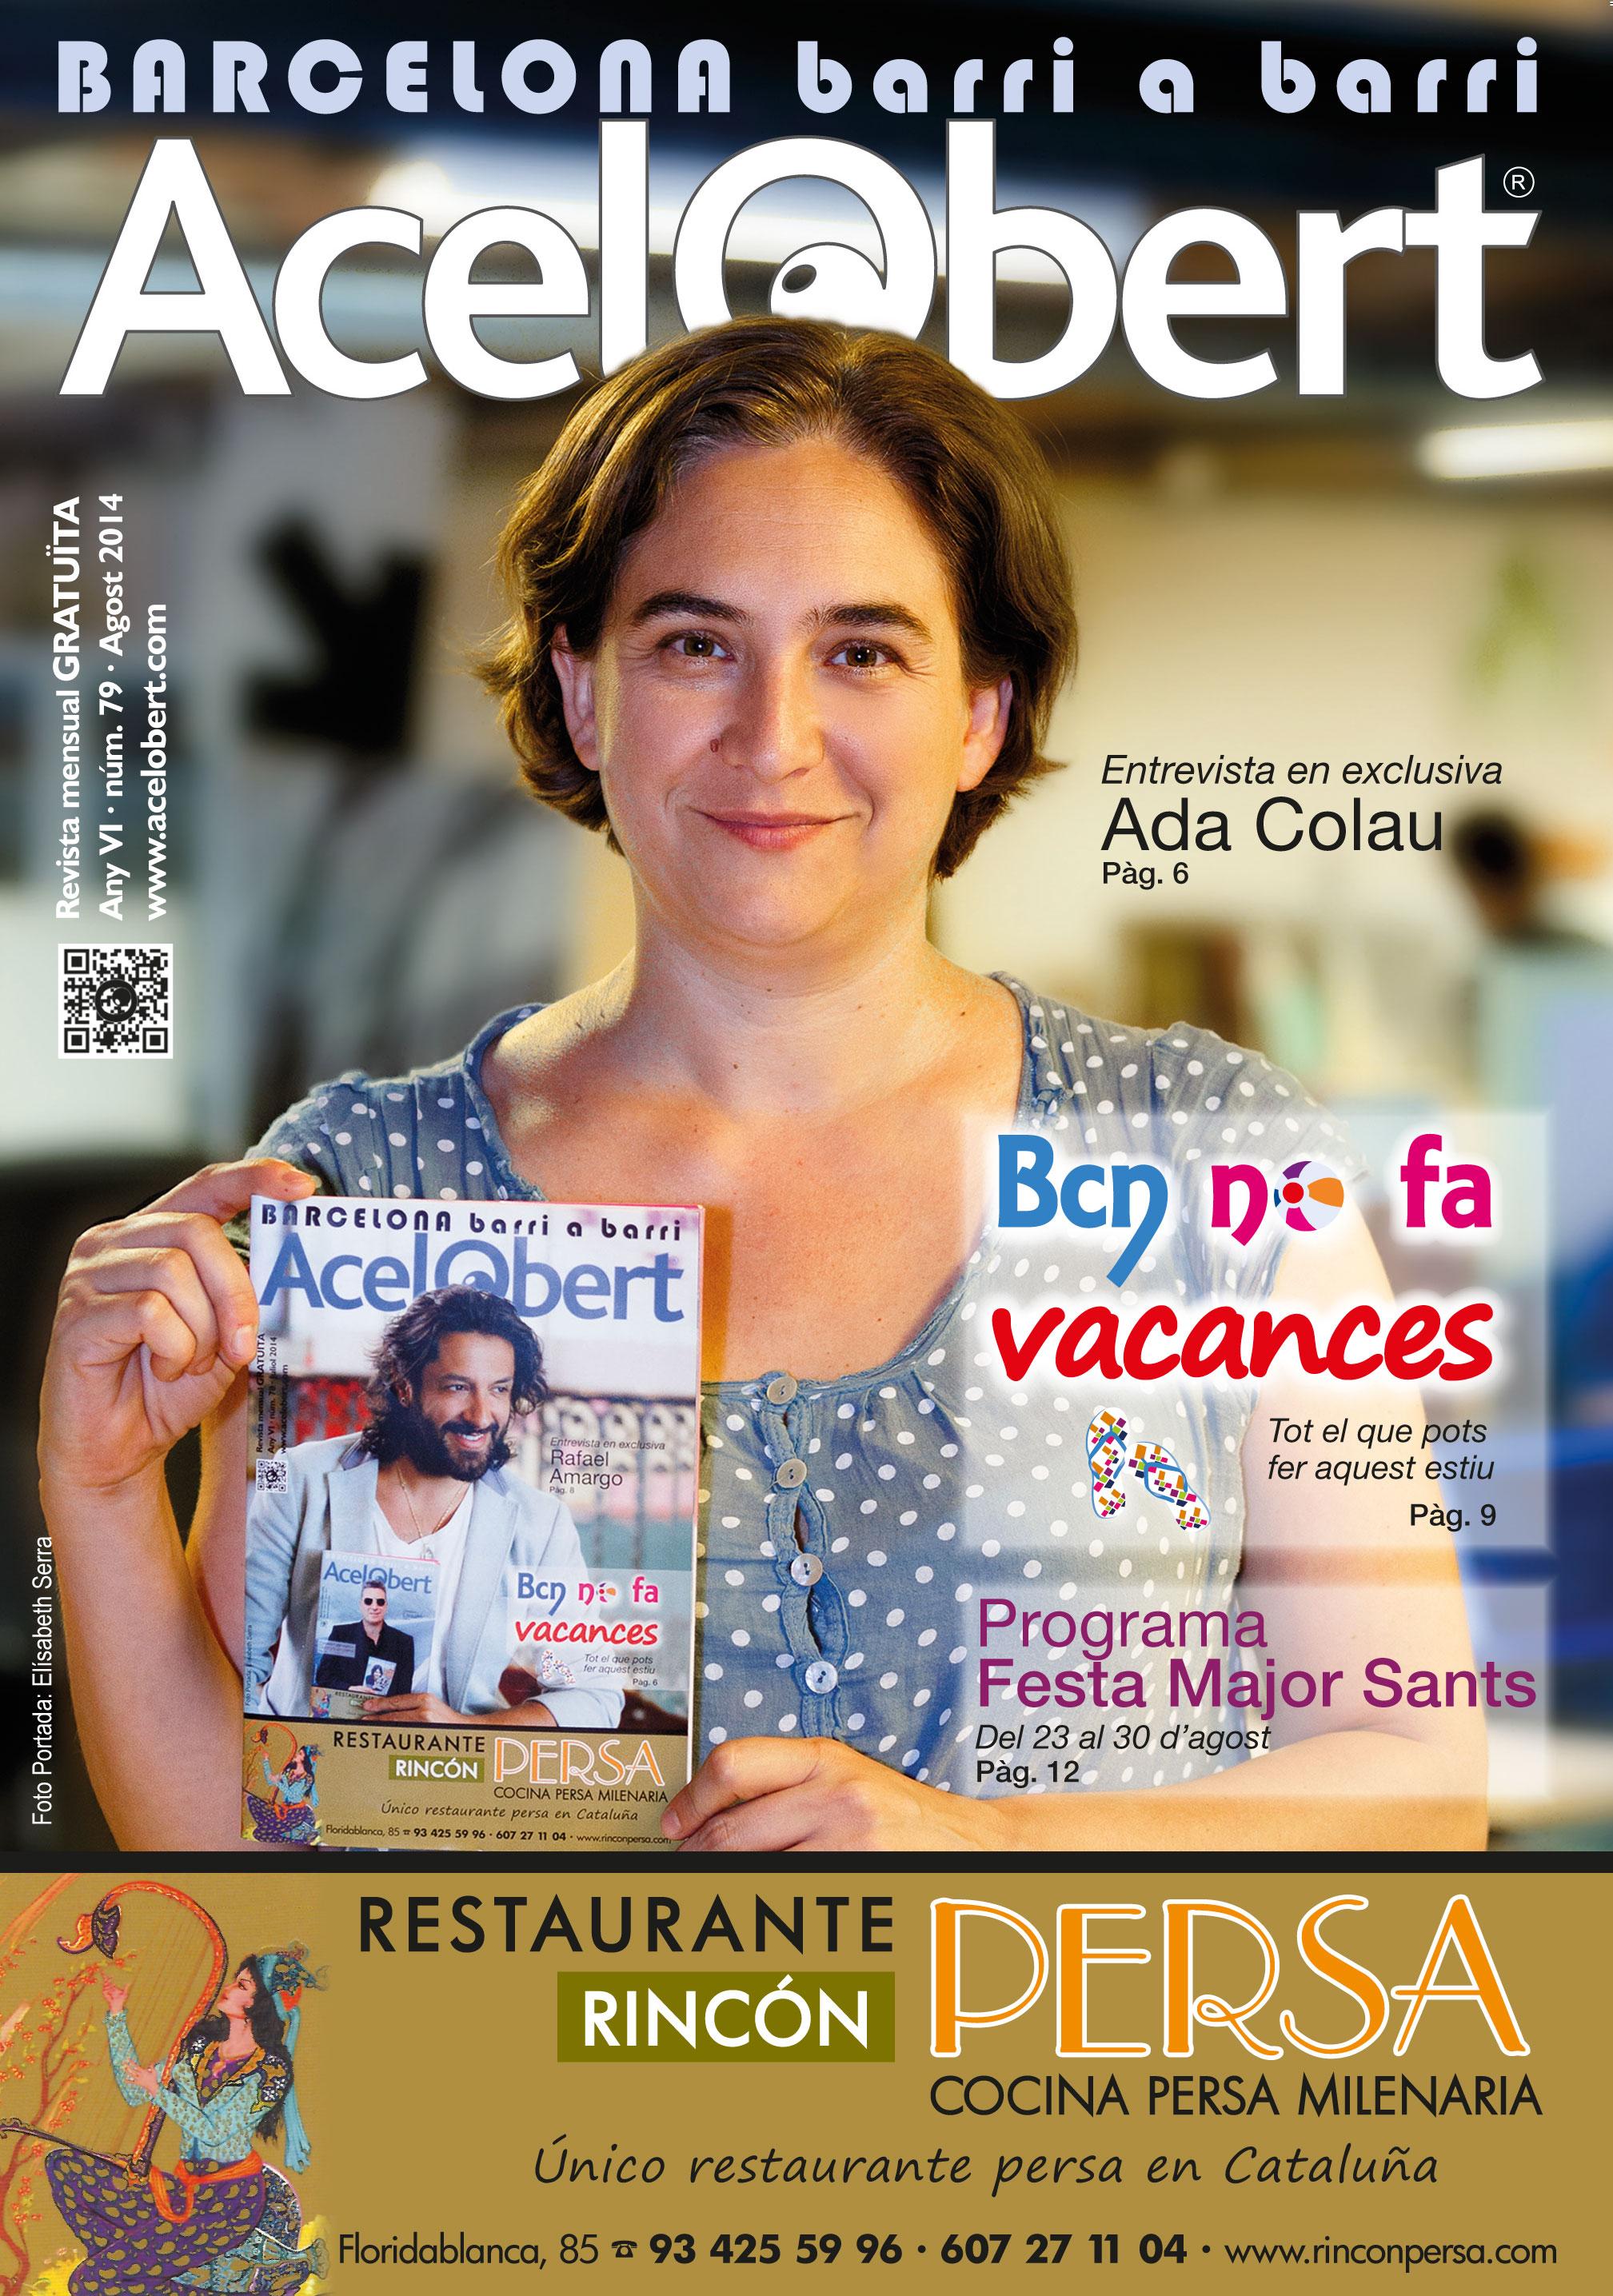 Acelobert Barcelona nº79 Agost 2014